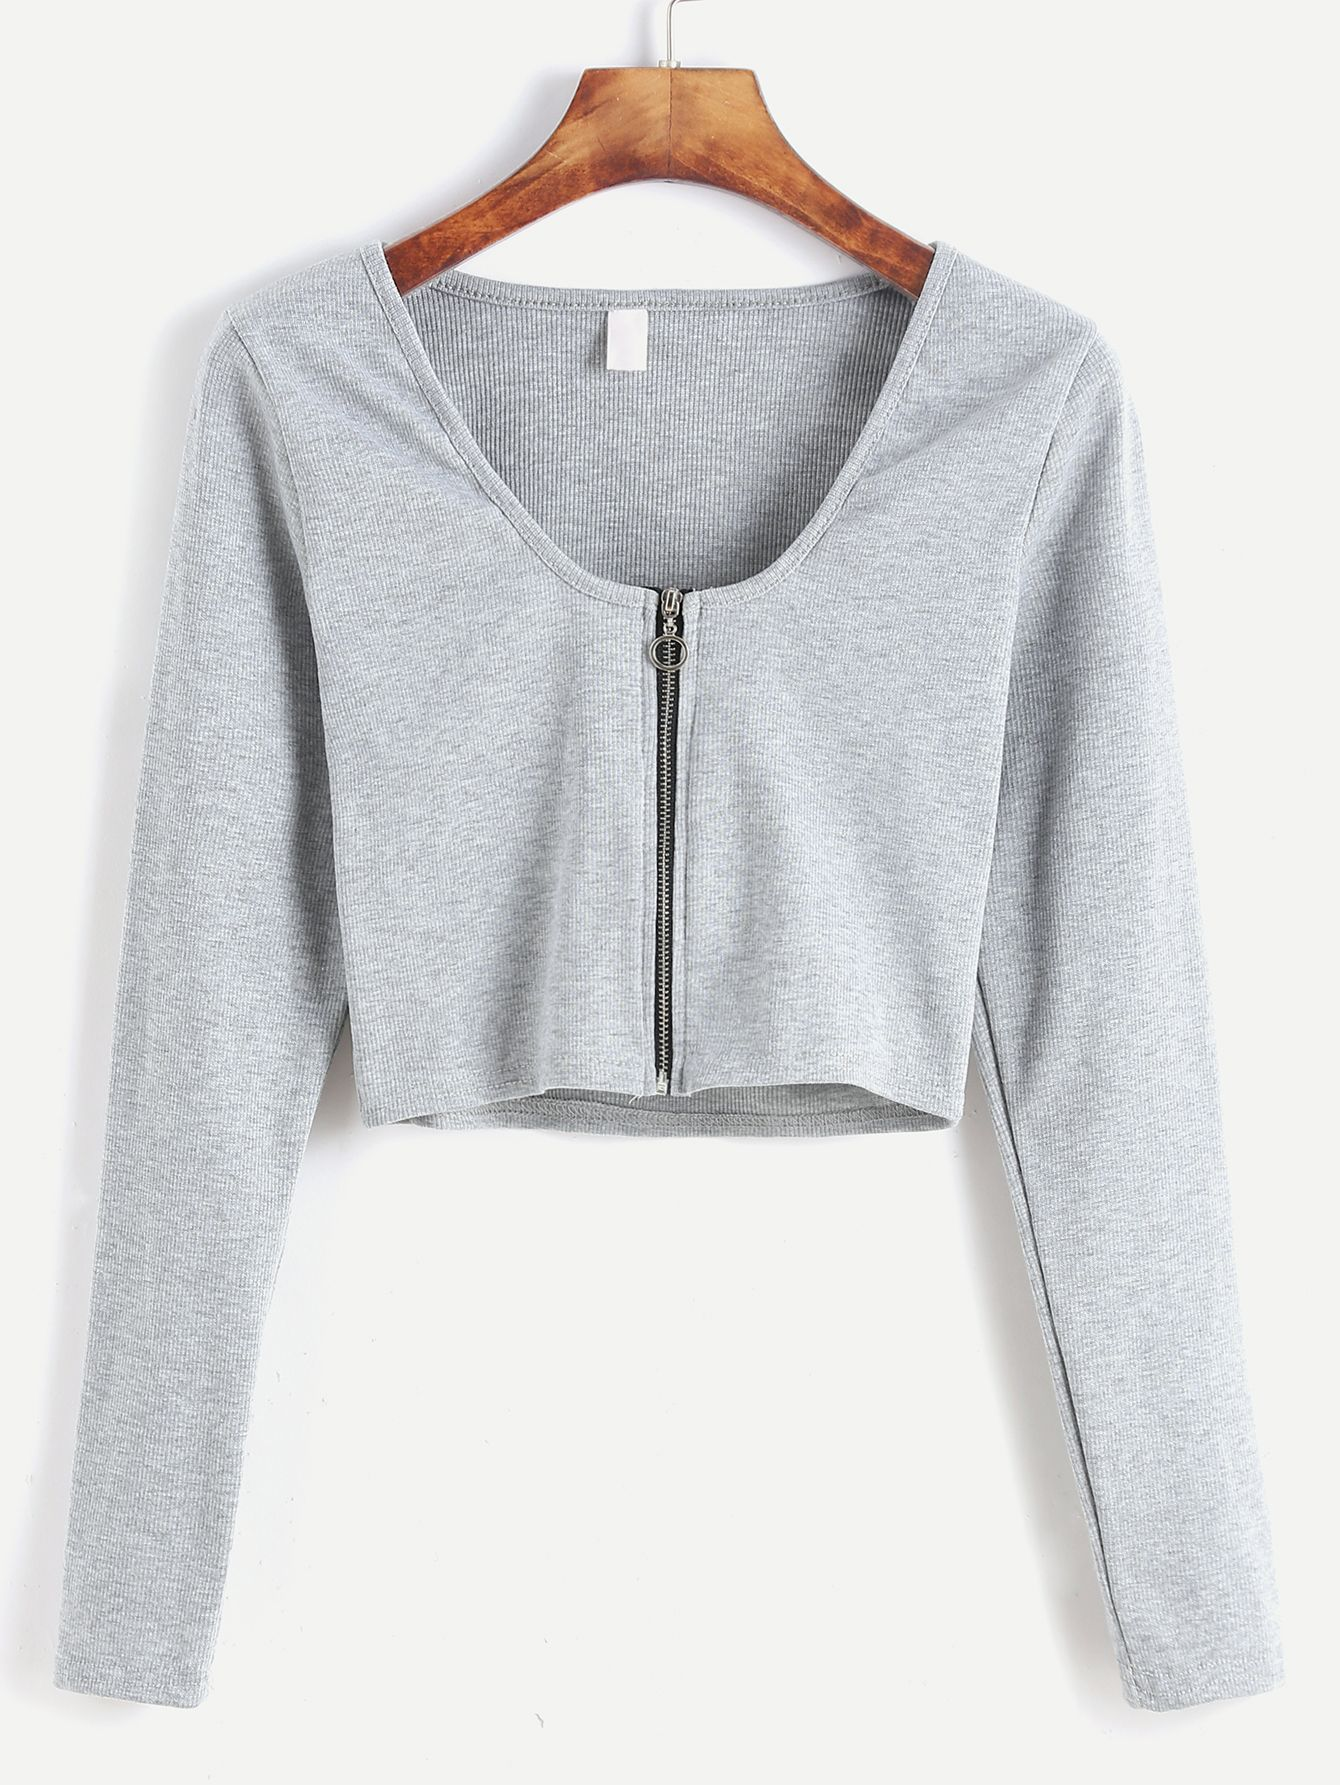 Camiseta corta con cremallera - gris claro-Spanish SheIn(Sheinside ... 33aa516f686